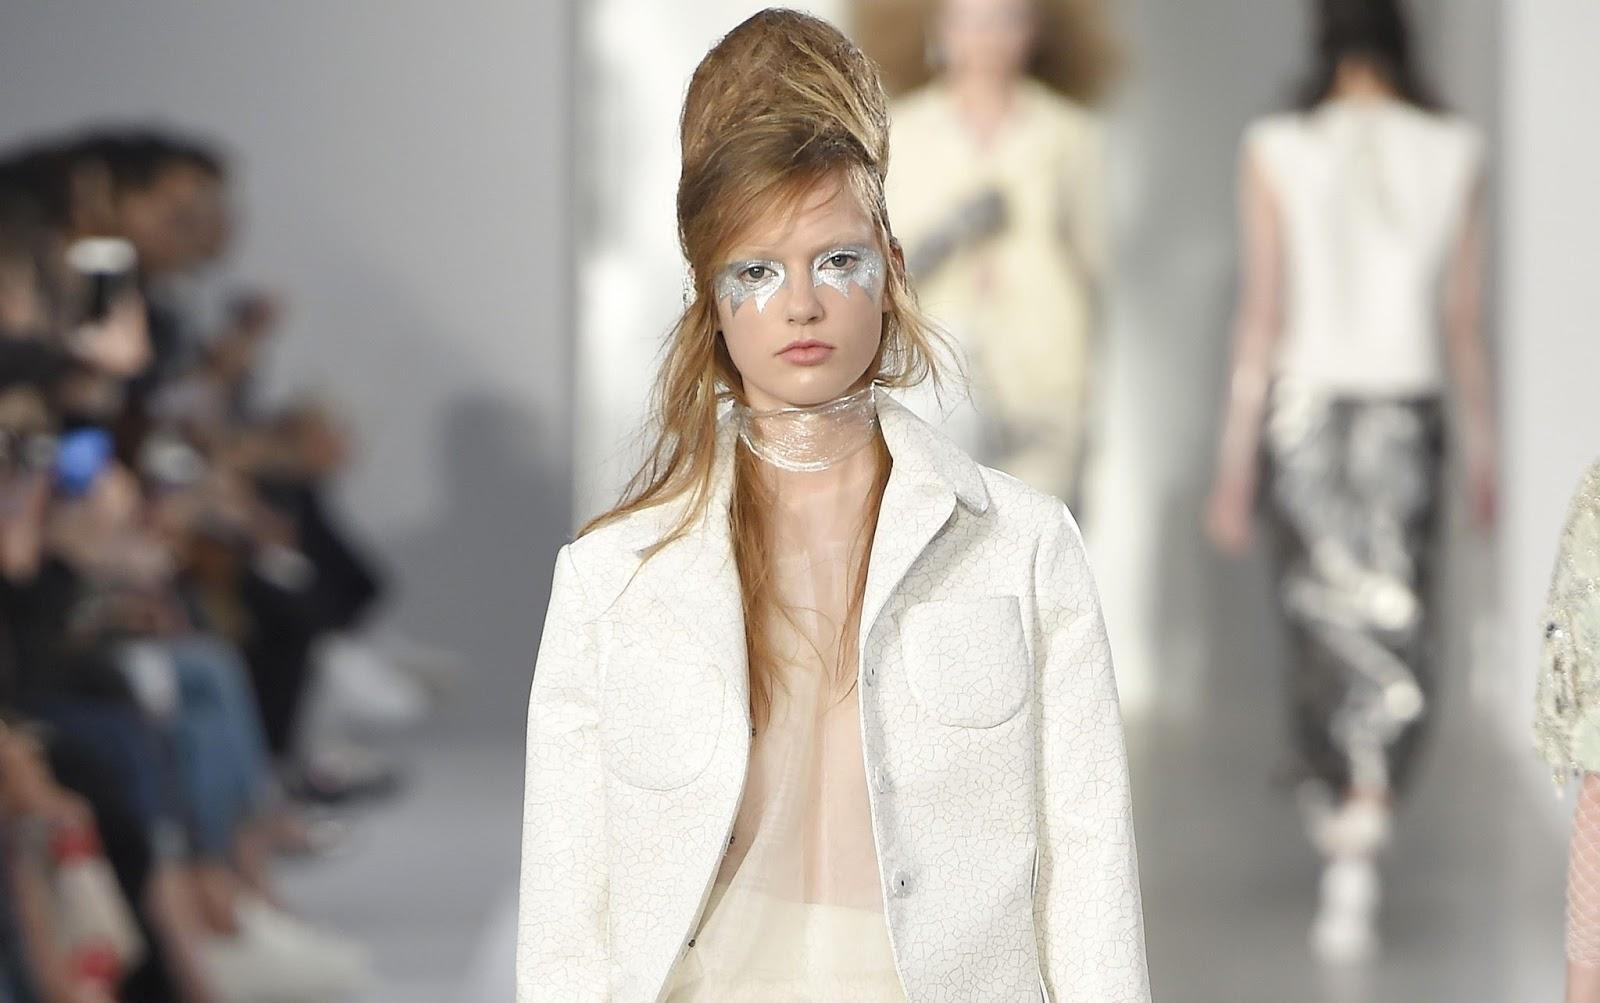 Fashion runway maison margiela spring 2016 by john for Maison margiela paris